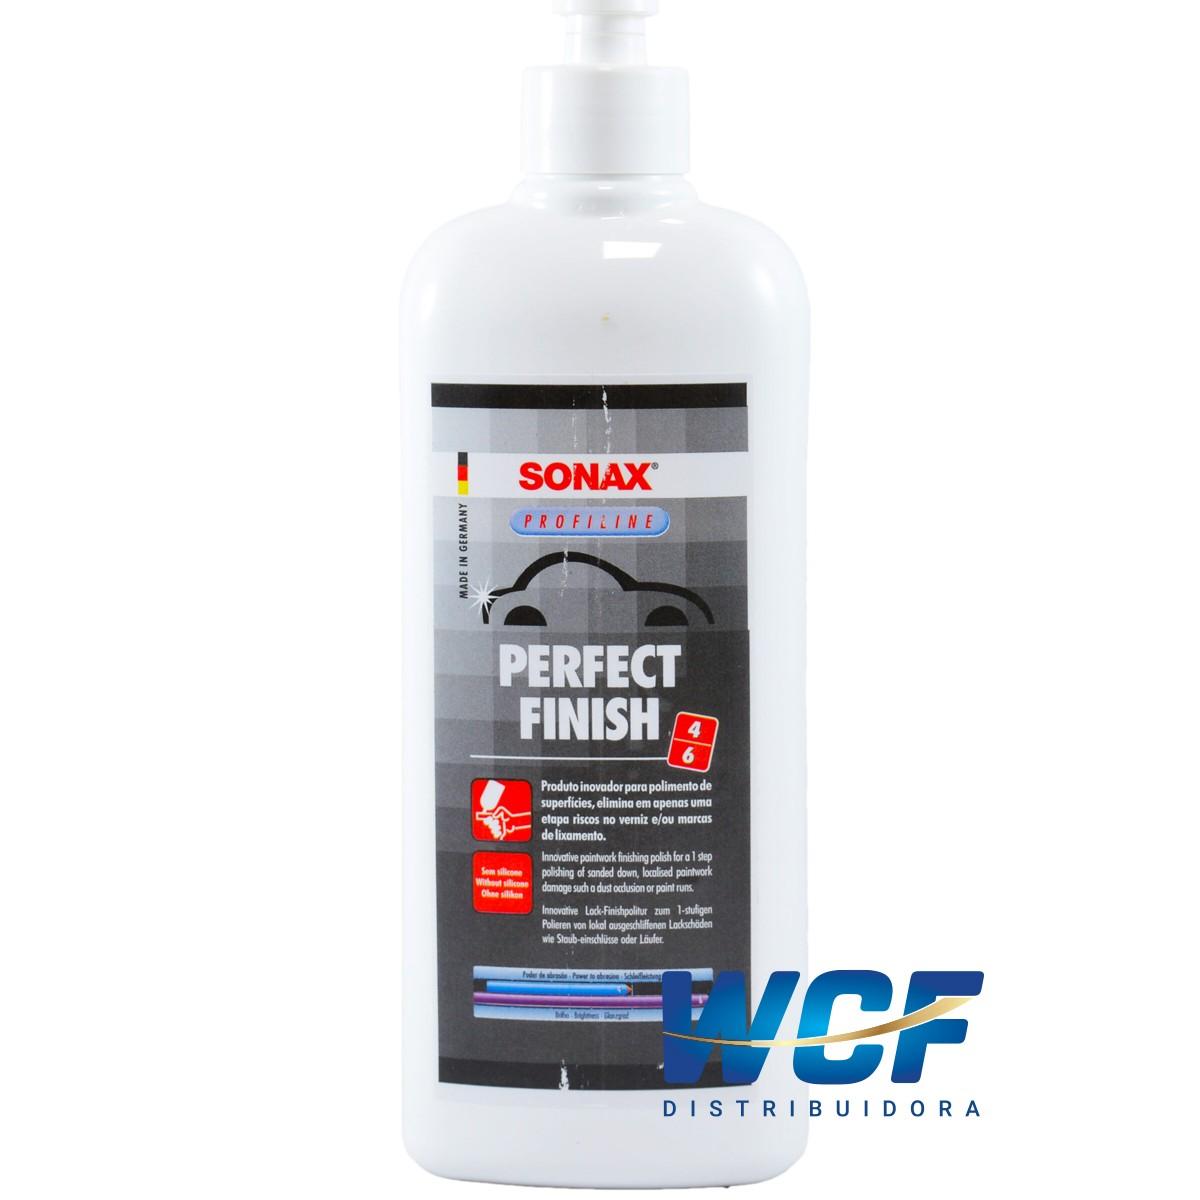 SONAX PERFECT FINISH 400 GR